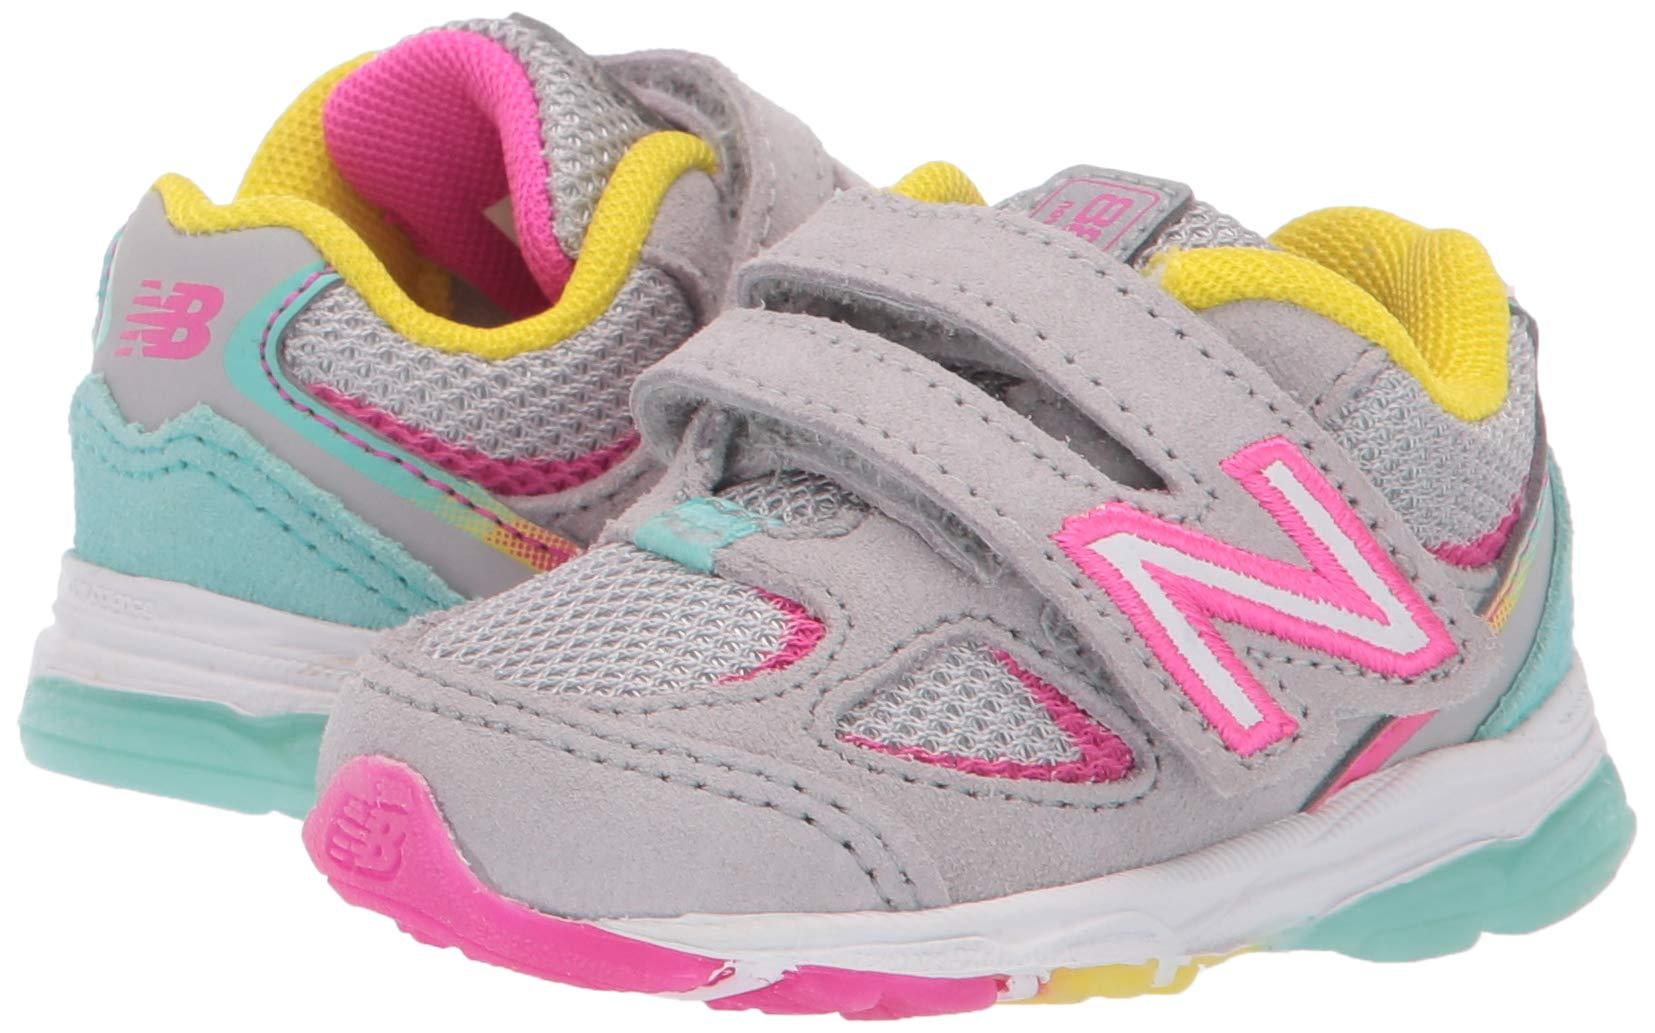 New Balance Girls' 888v2 Hook and Loop Running Shoe, Grey/Rainbow, 2 W US Infant by New Balance (Image #6)